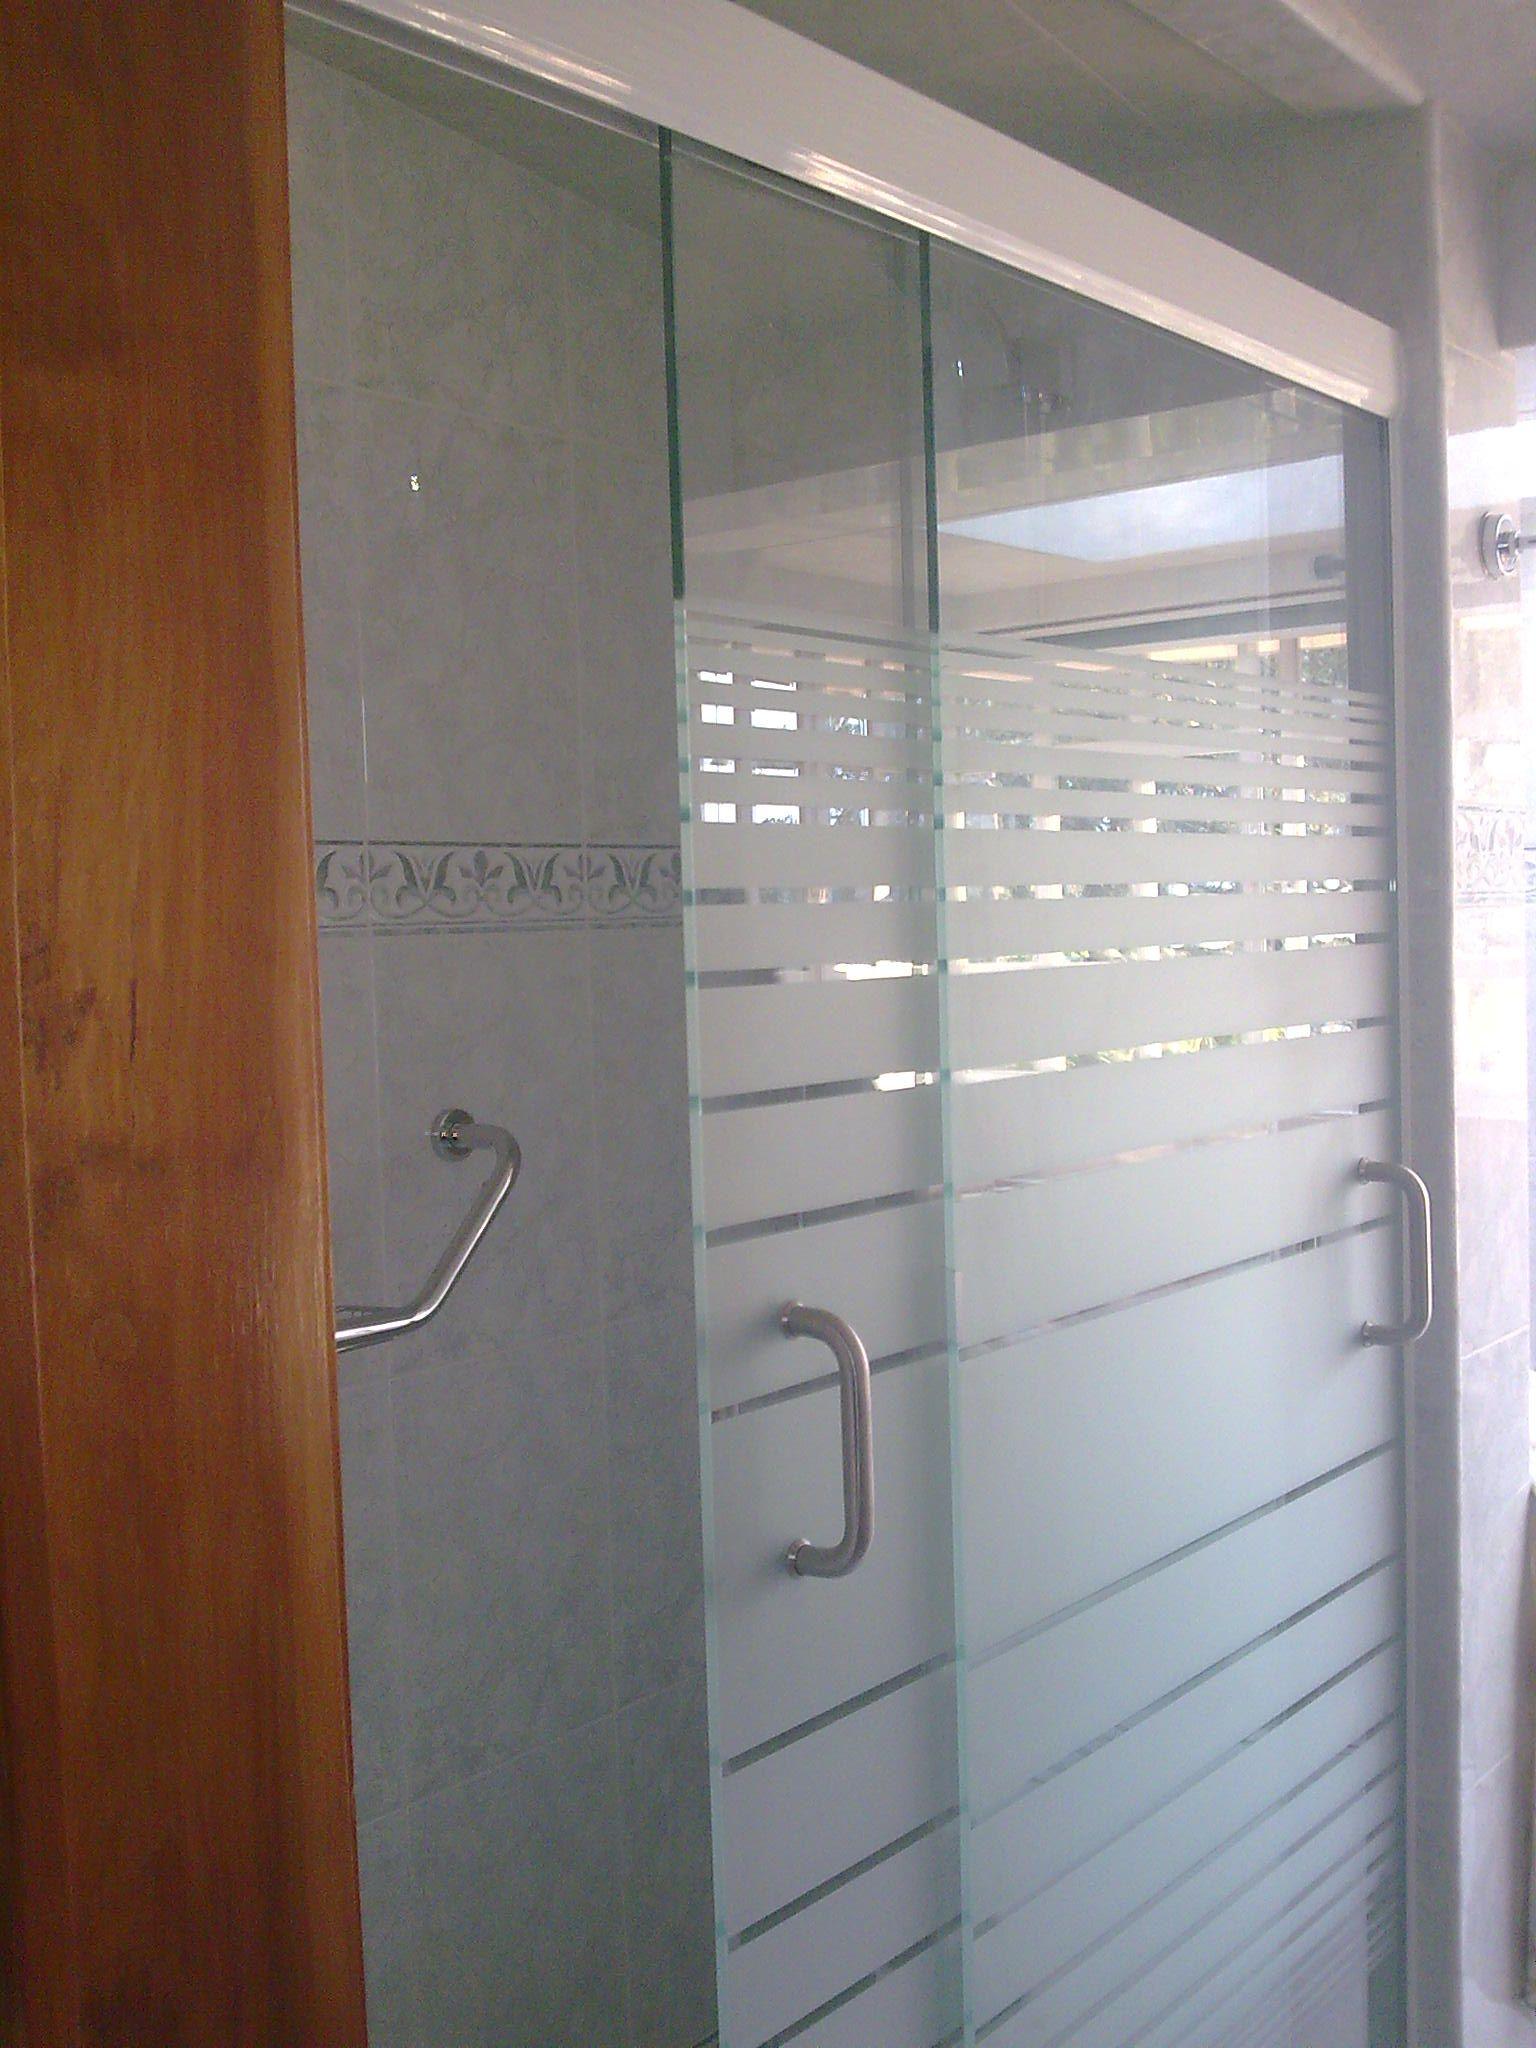 Amazing Cancel de ba o Cancel bathroom tempered glass mm